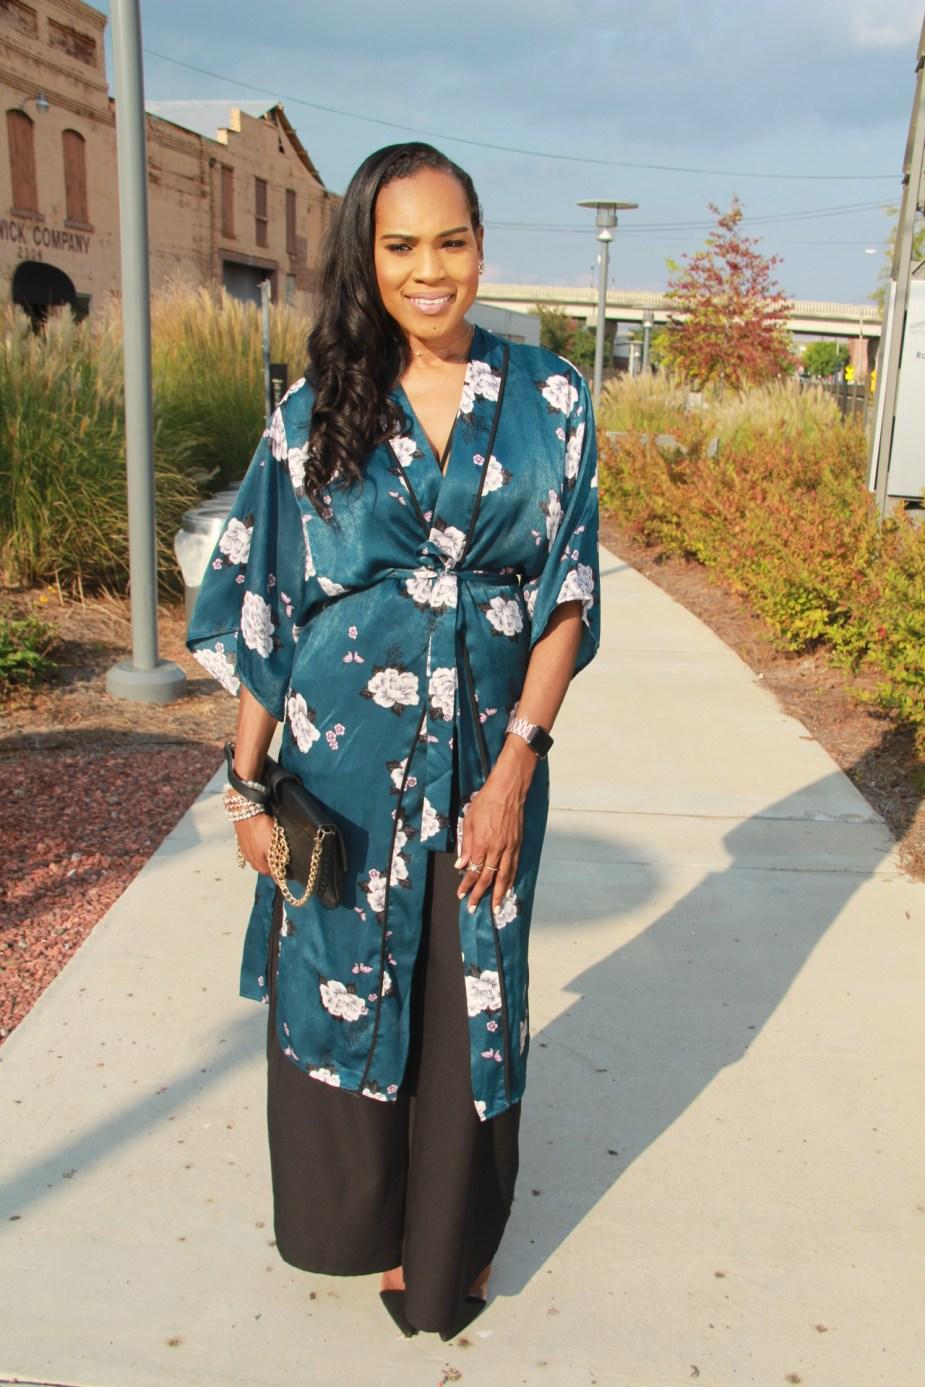 Style-files-Monteau-Green-floral-kimono-Boohoo-Wideleg-pants-zara-pvc-clear-black-pumps-forever21-lace-corset-bodysuit-ooohlalablog-16